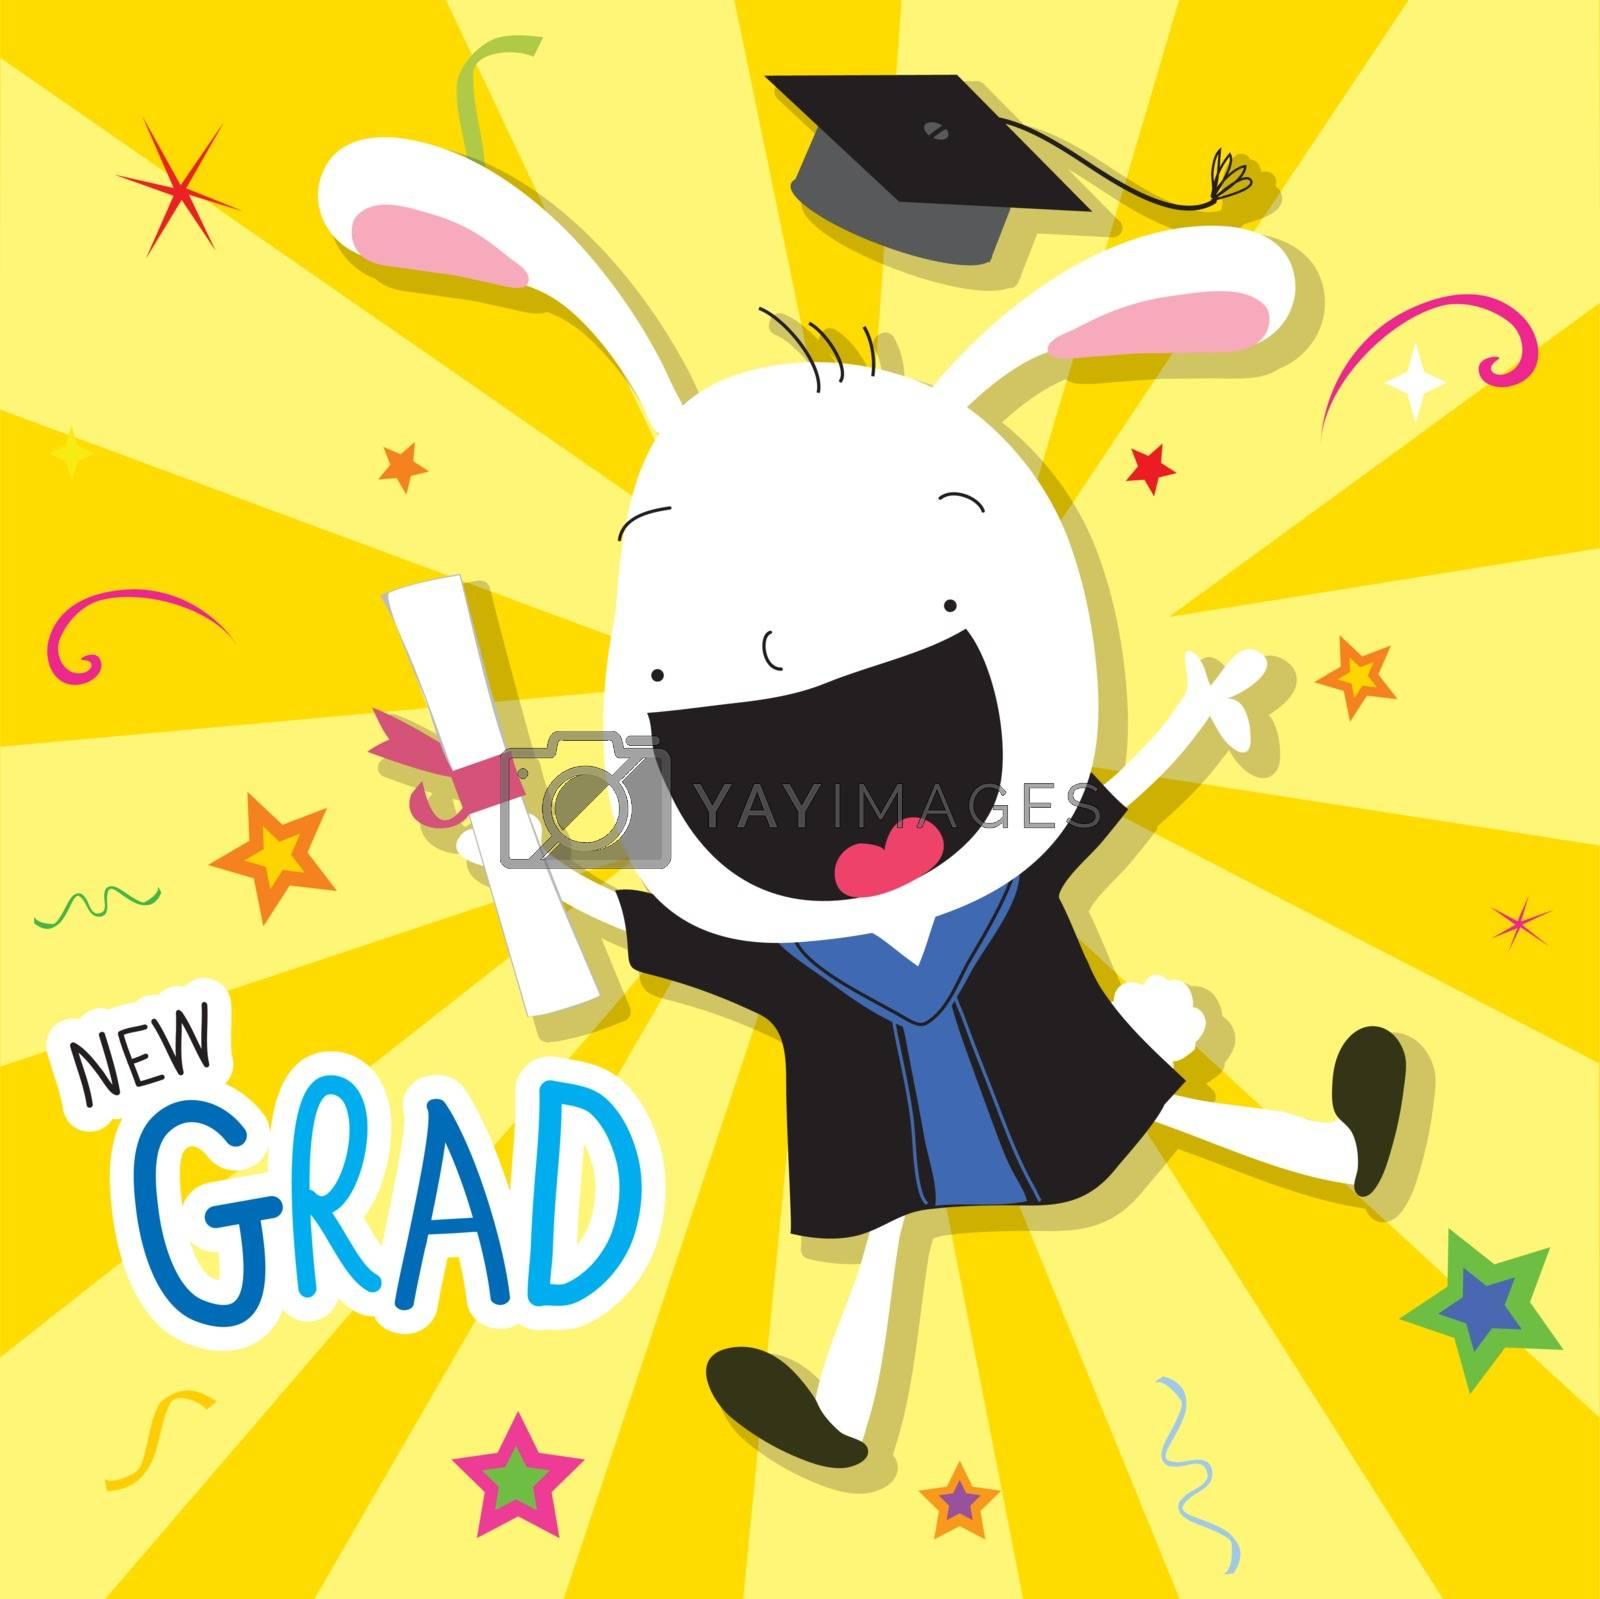 Congratulation New Graduate of Rabbit Animal Cute Cartoon Vector